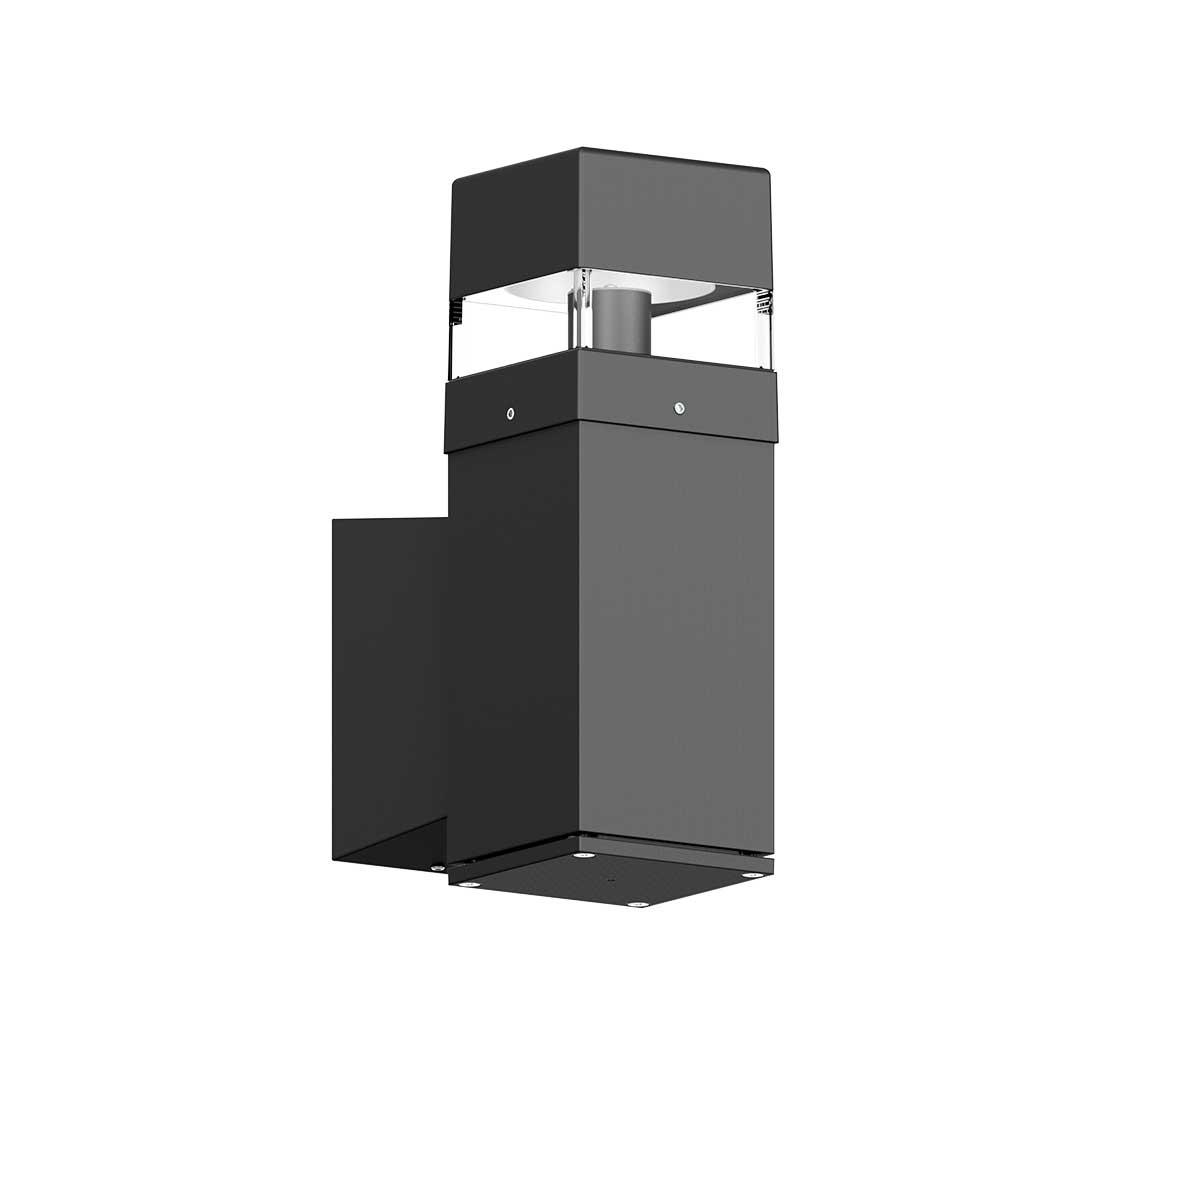 Lightsoft mini wall surface square prod 1200x1200